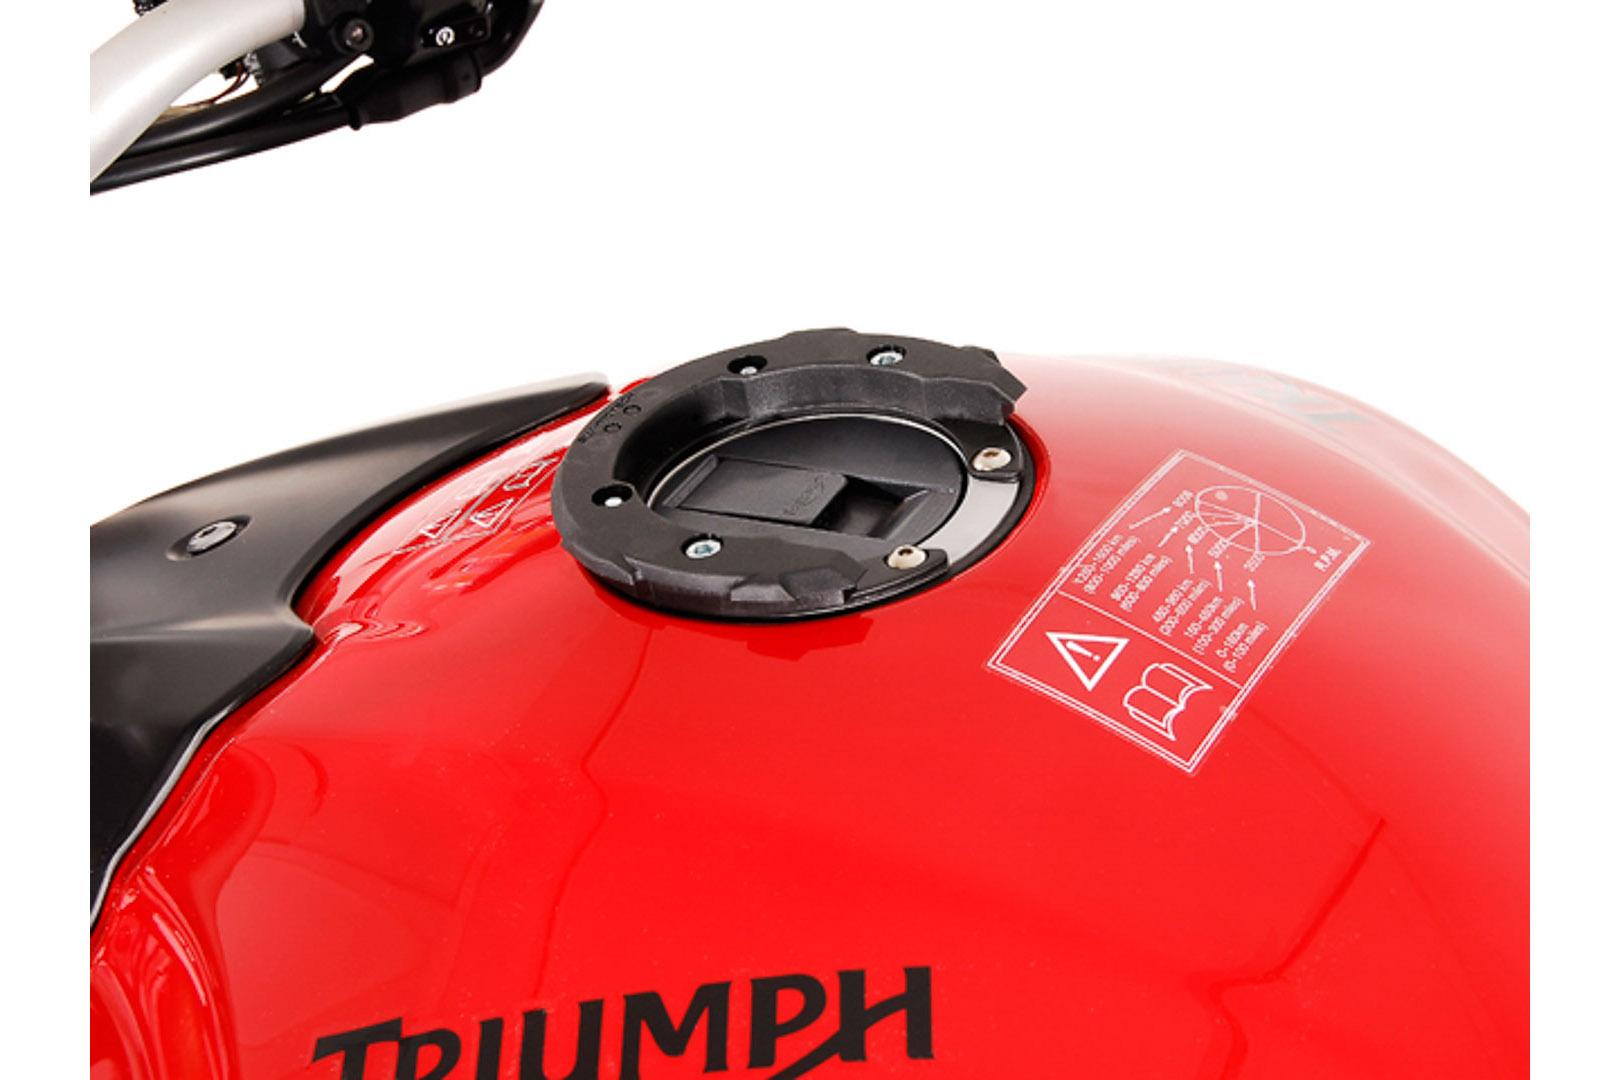 EVO tankkilaukun kiinnike BMW/MV Agusta/Triumph 6 ruuvia